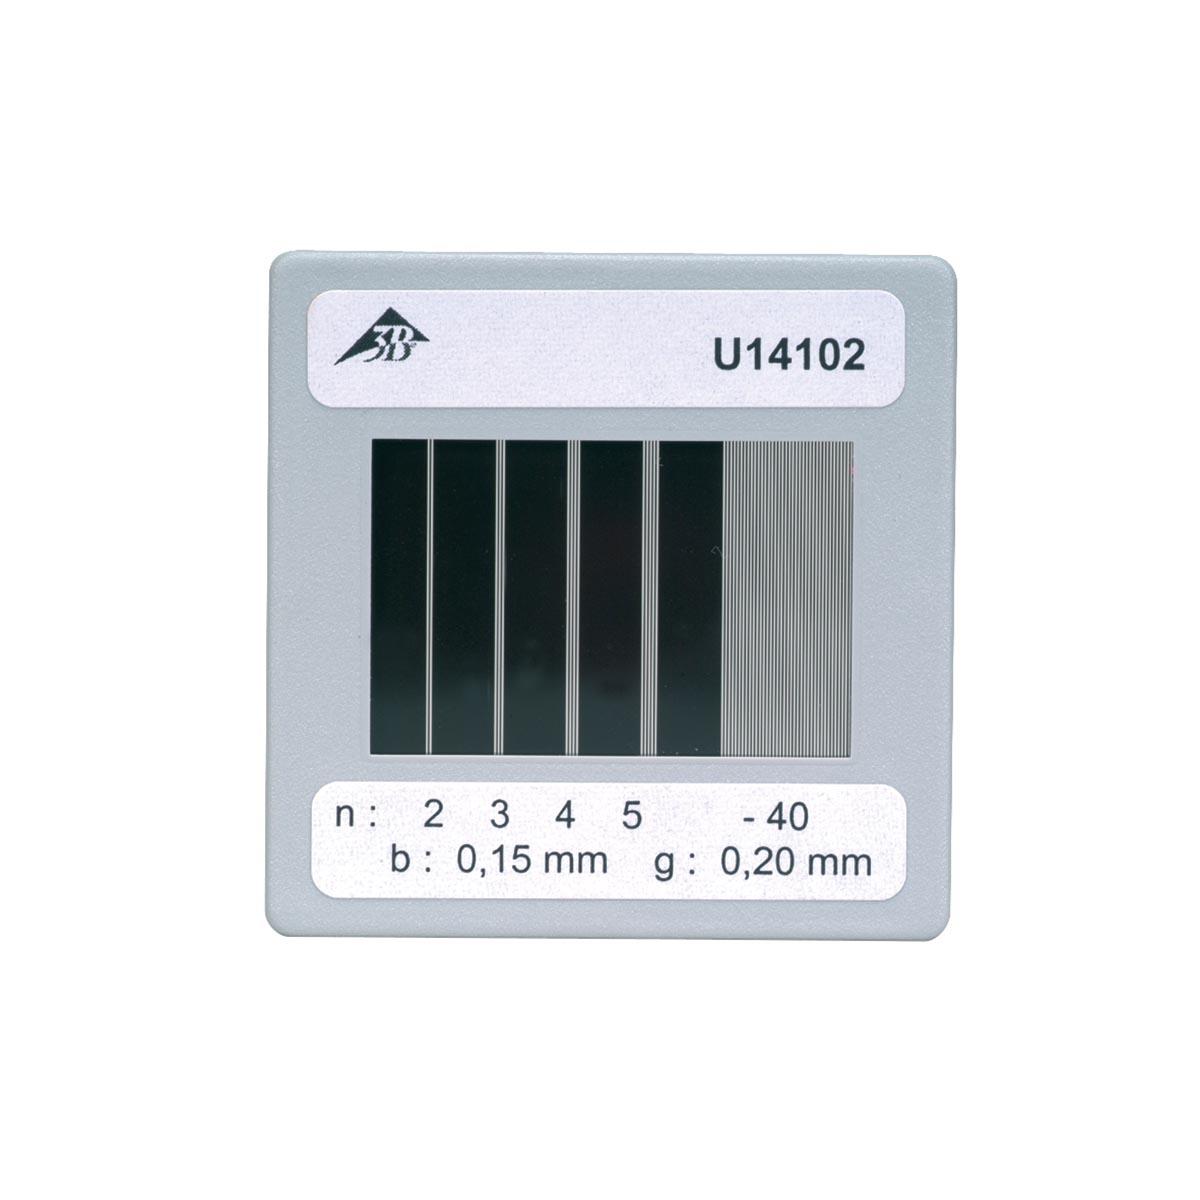 3B Scientific GmbH U8475550 Holder for diode Laser K